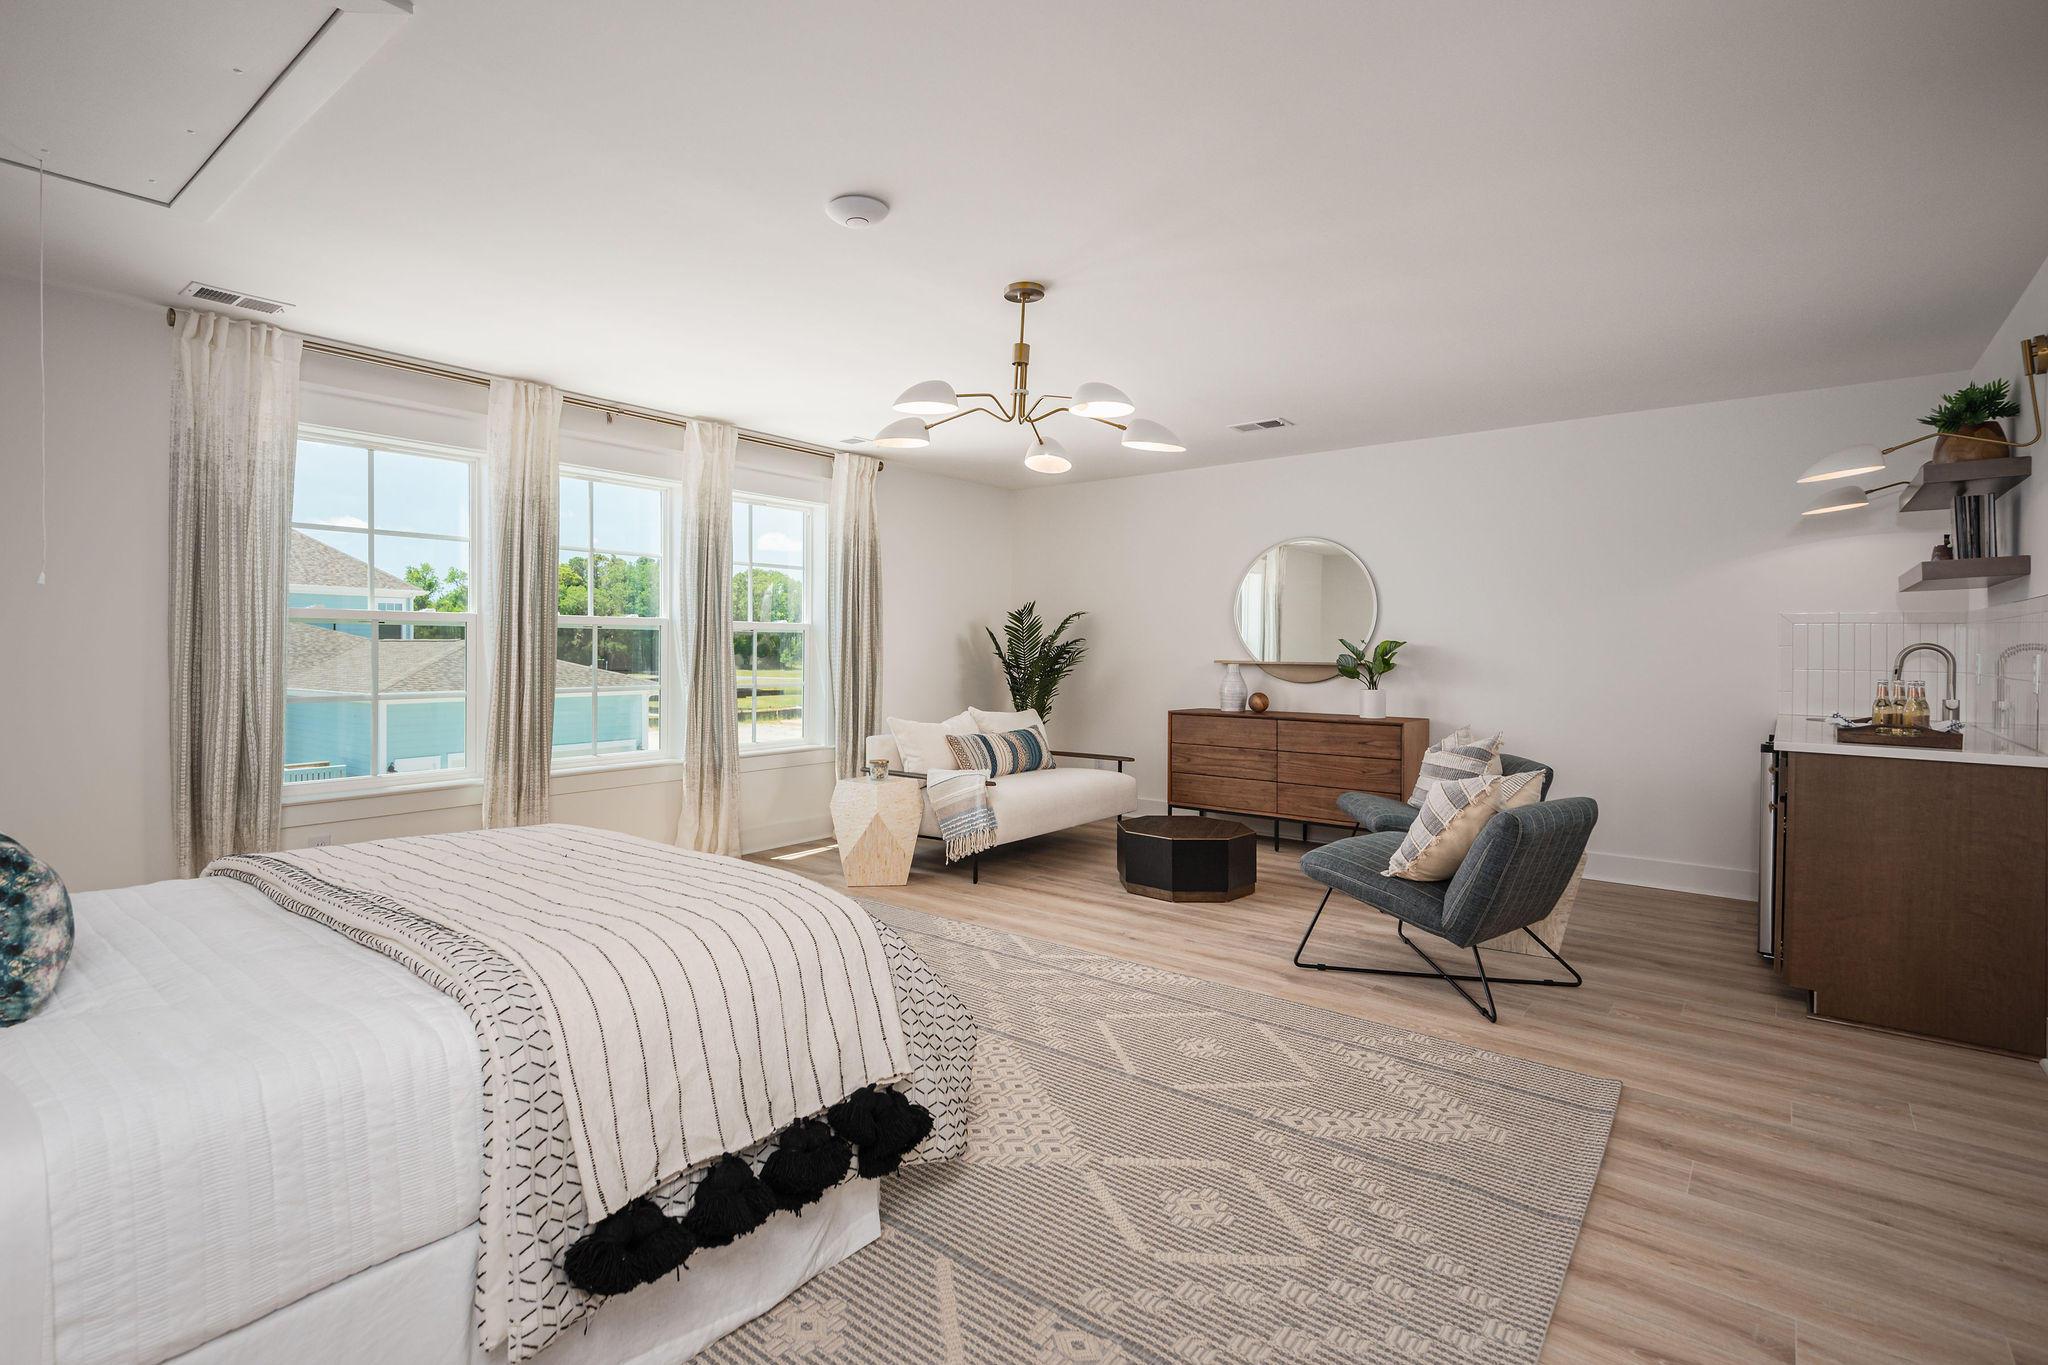 Midtown Homes For Sale - 1533 Kepley, Mount Pleasant, SC - 10